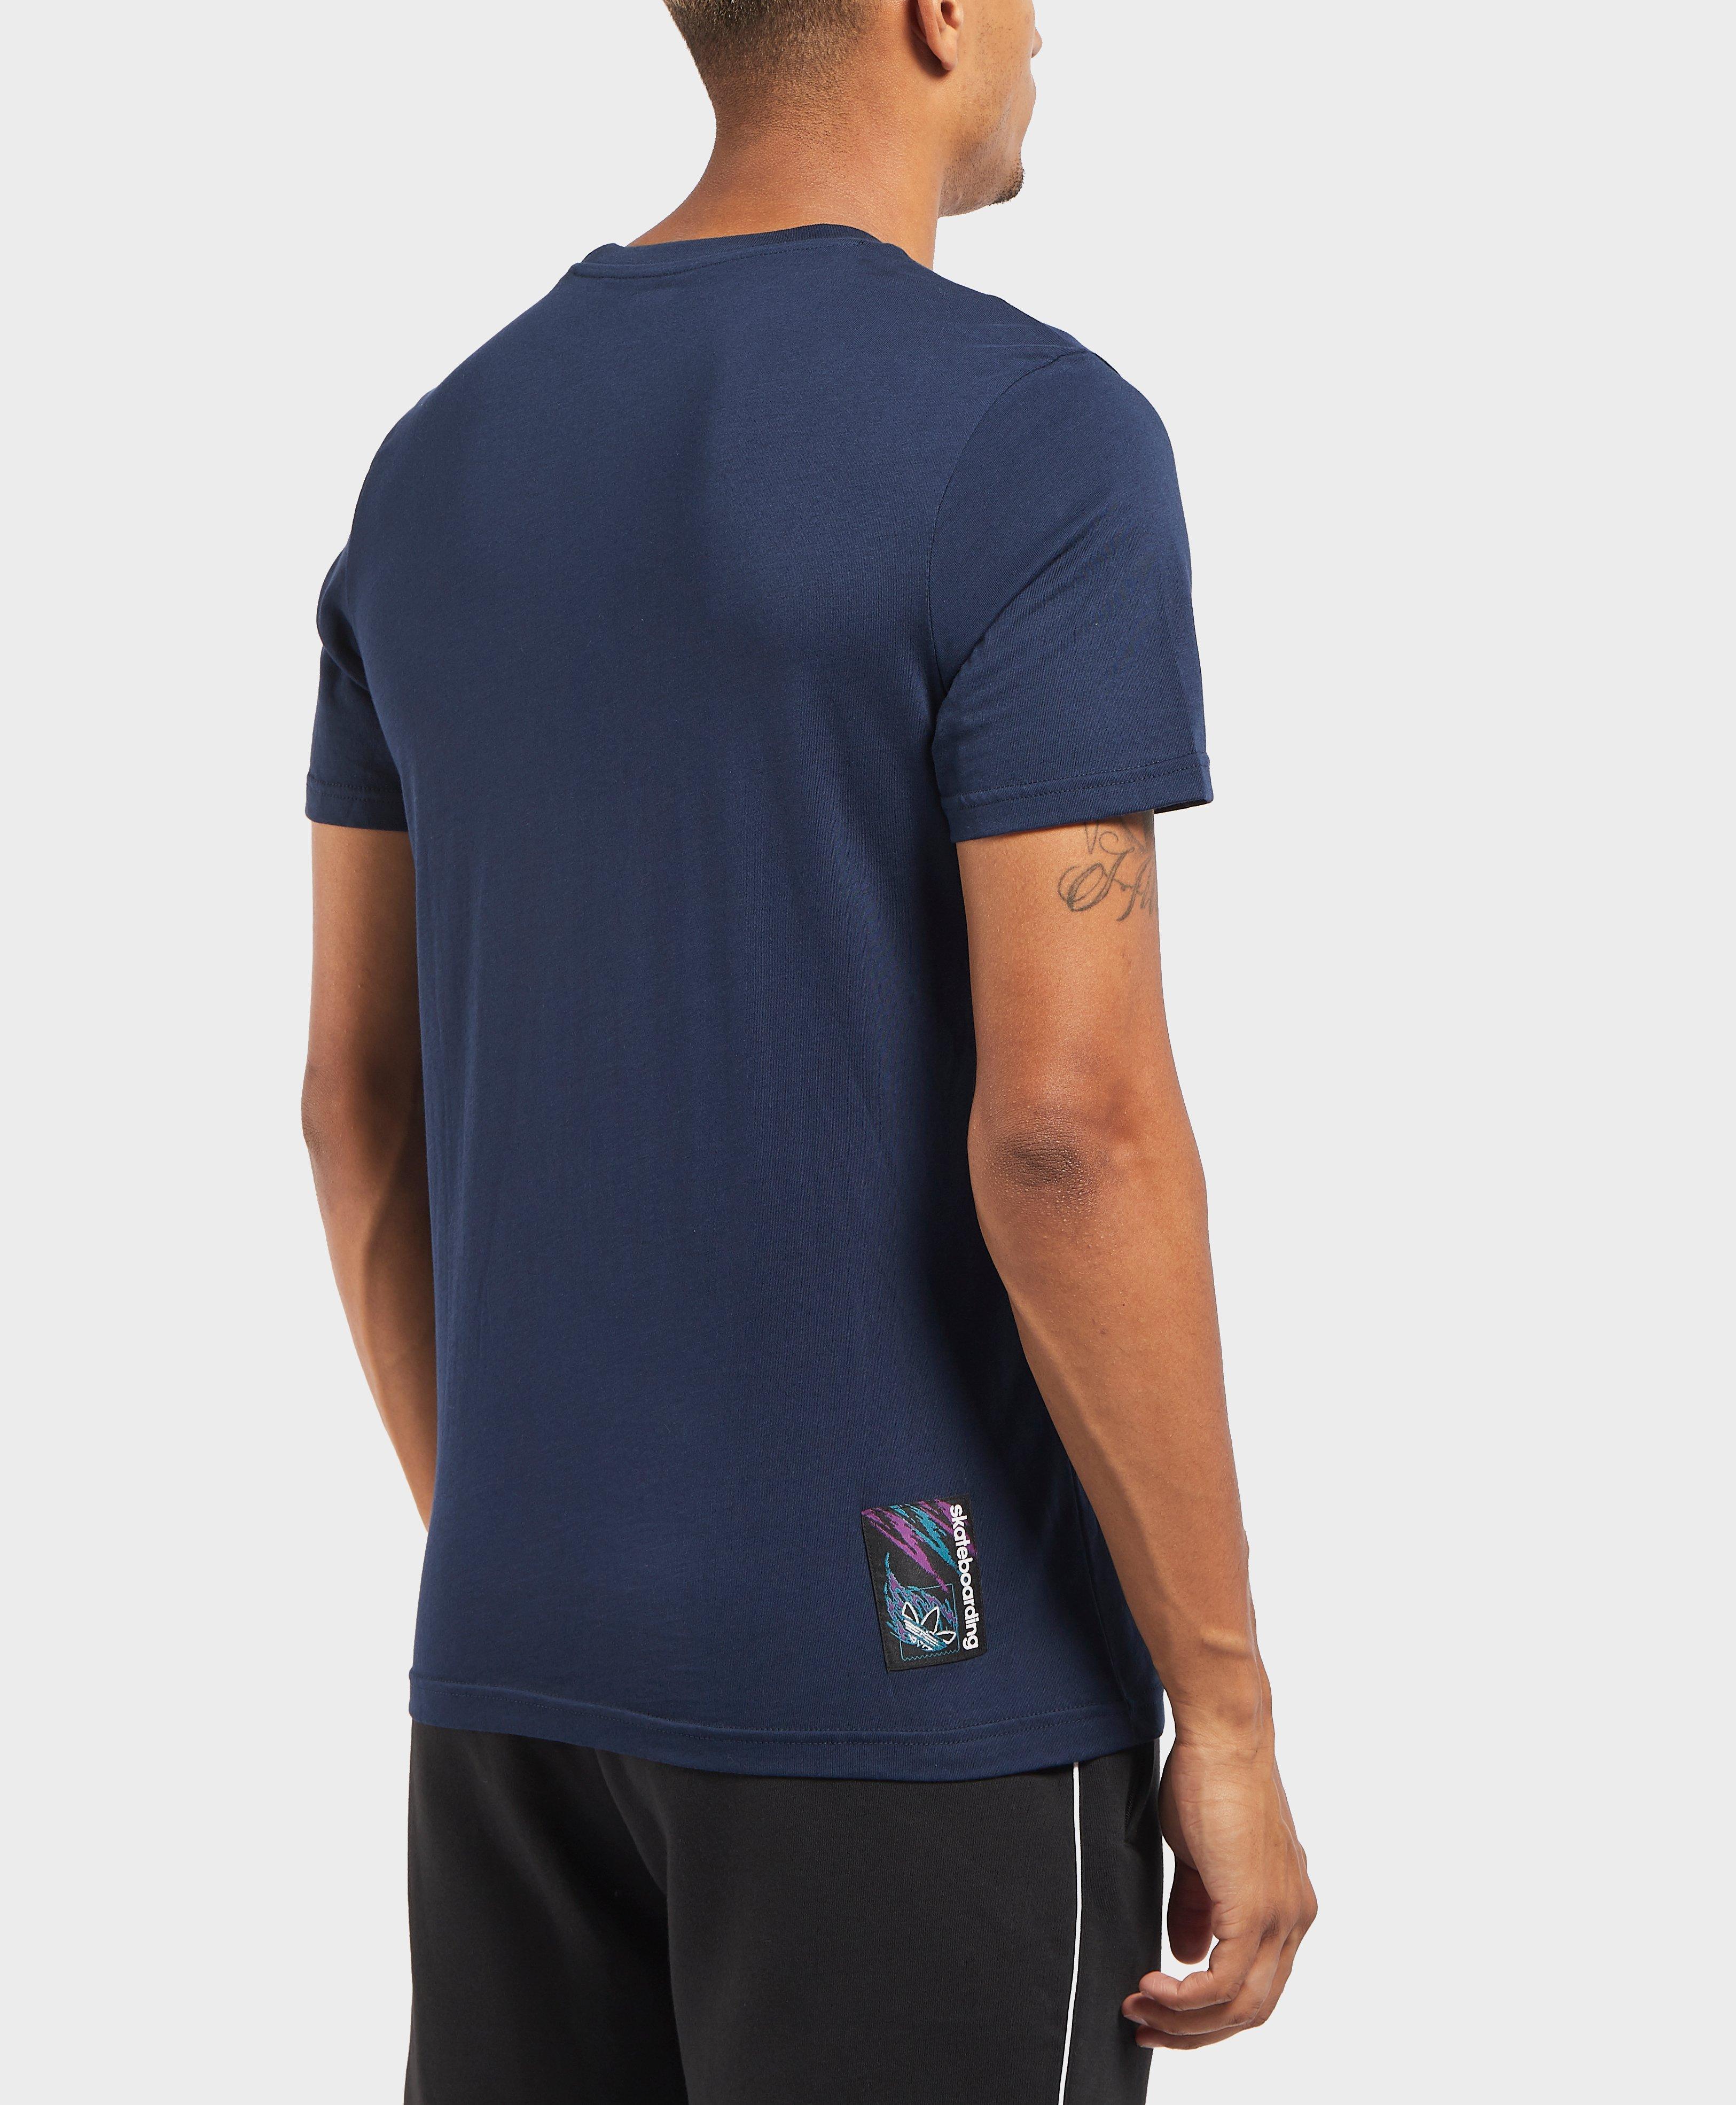 d6f3ced29bc Lyst - Adidas Originals 90s Tennis Logo Short Sleeve T-shirt in Blue for Men